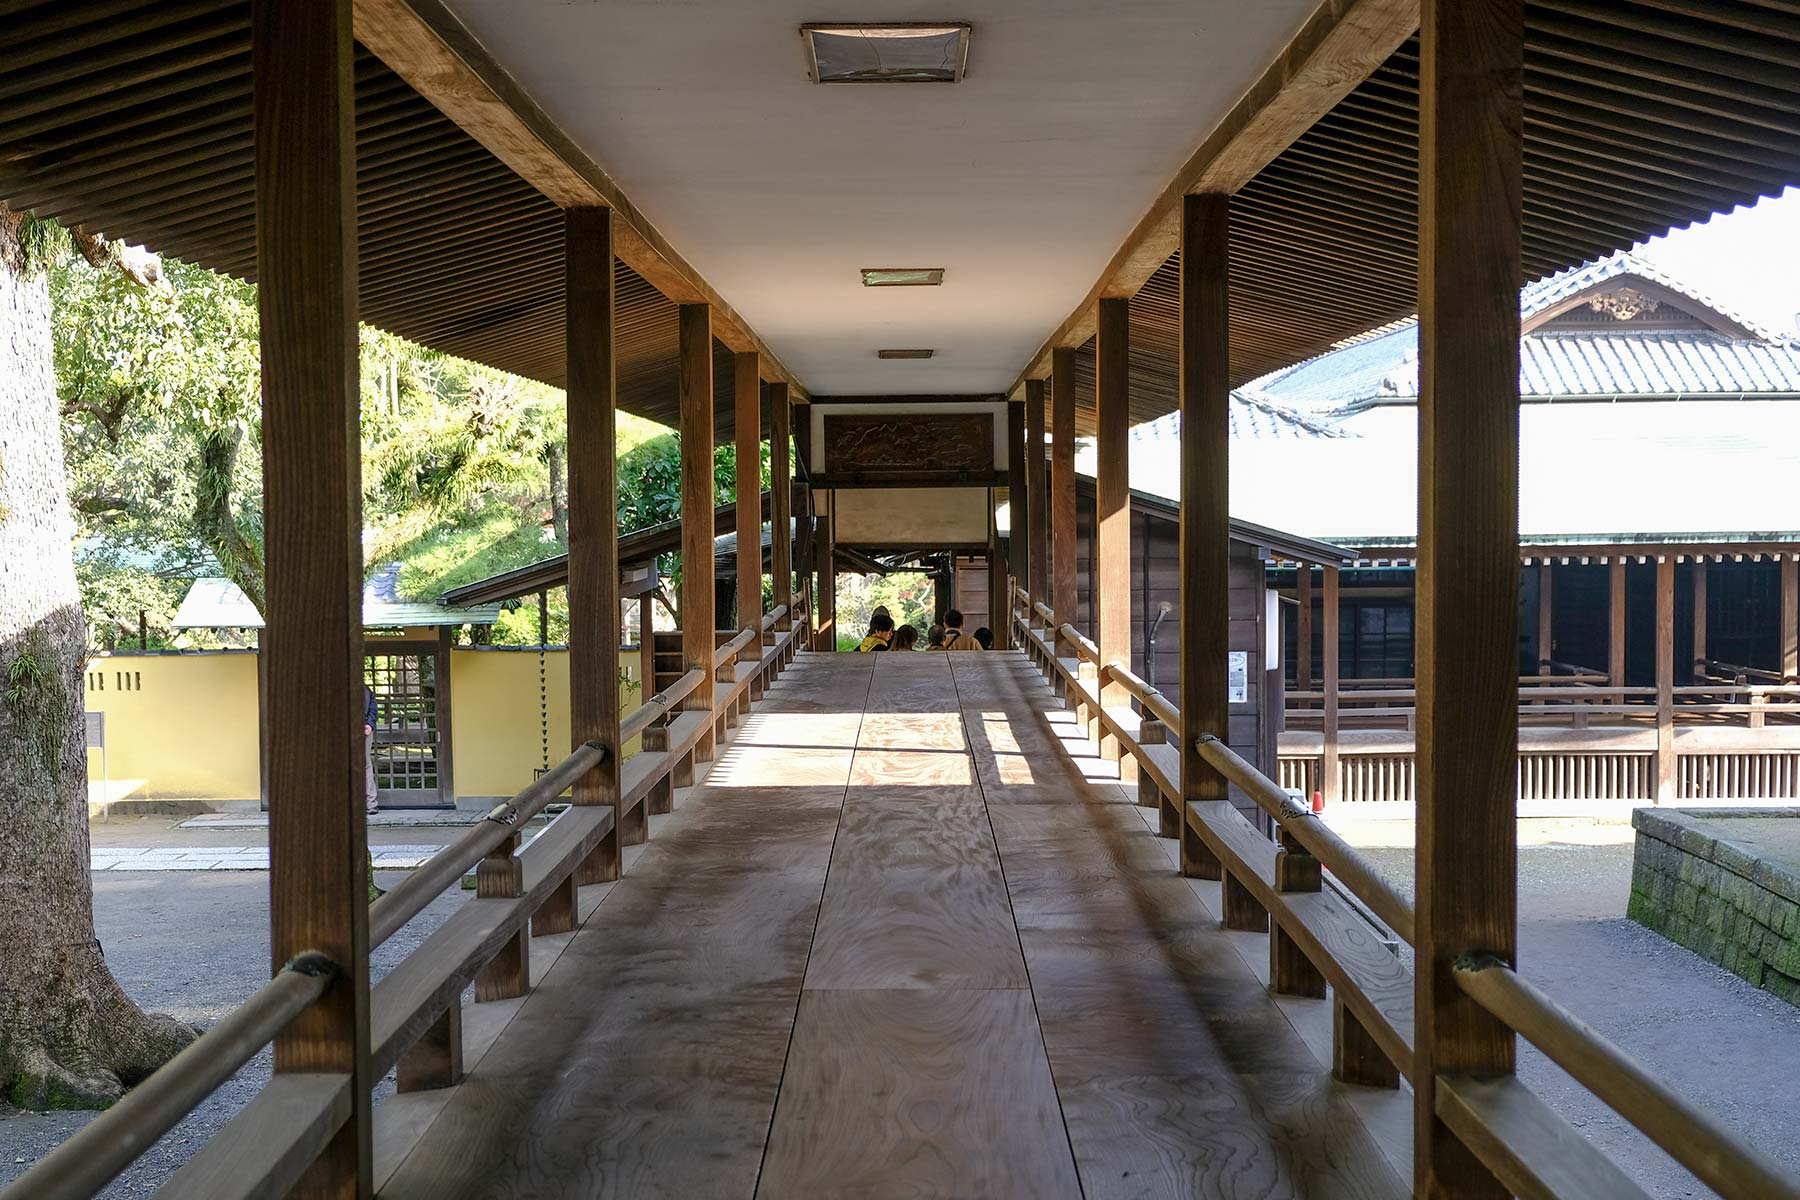 Shibamata Taishakuten Tempel in Japan